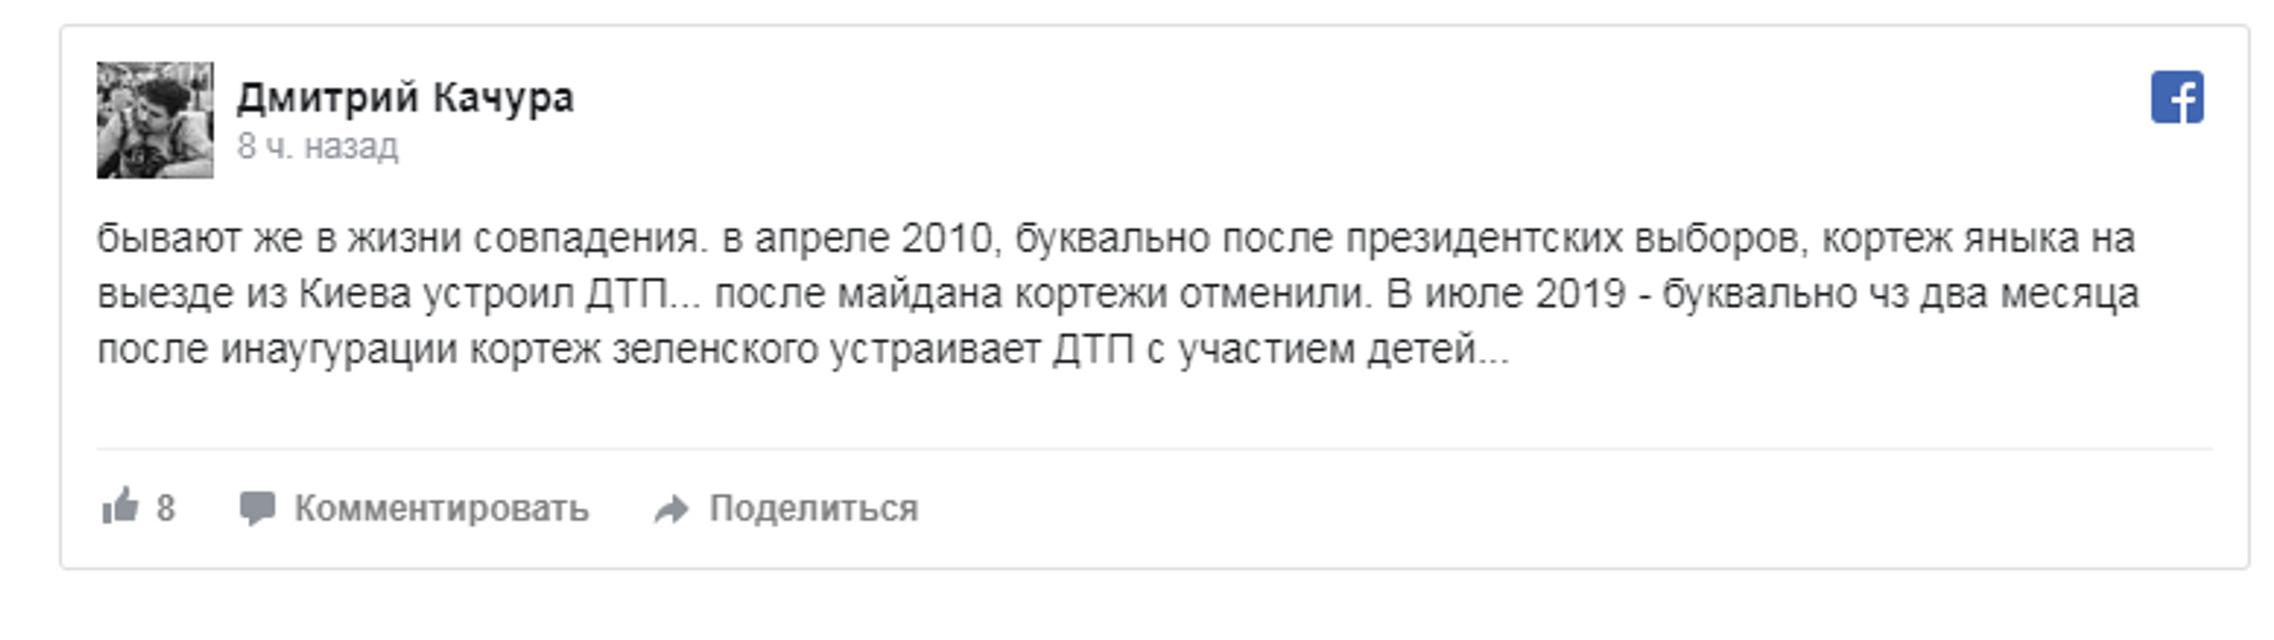 Кортеж Зеленского попал в ДТП – РЕАКЦИЯ СЕТИ - фото 184263